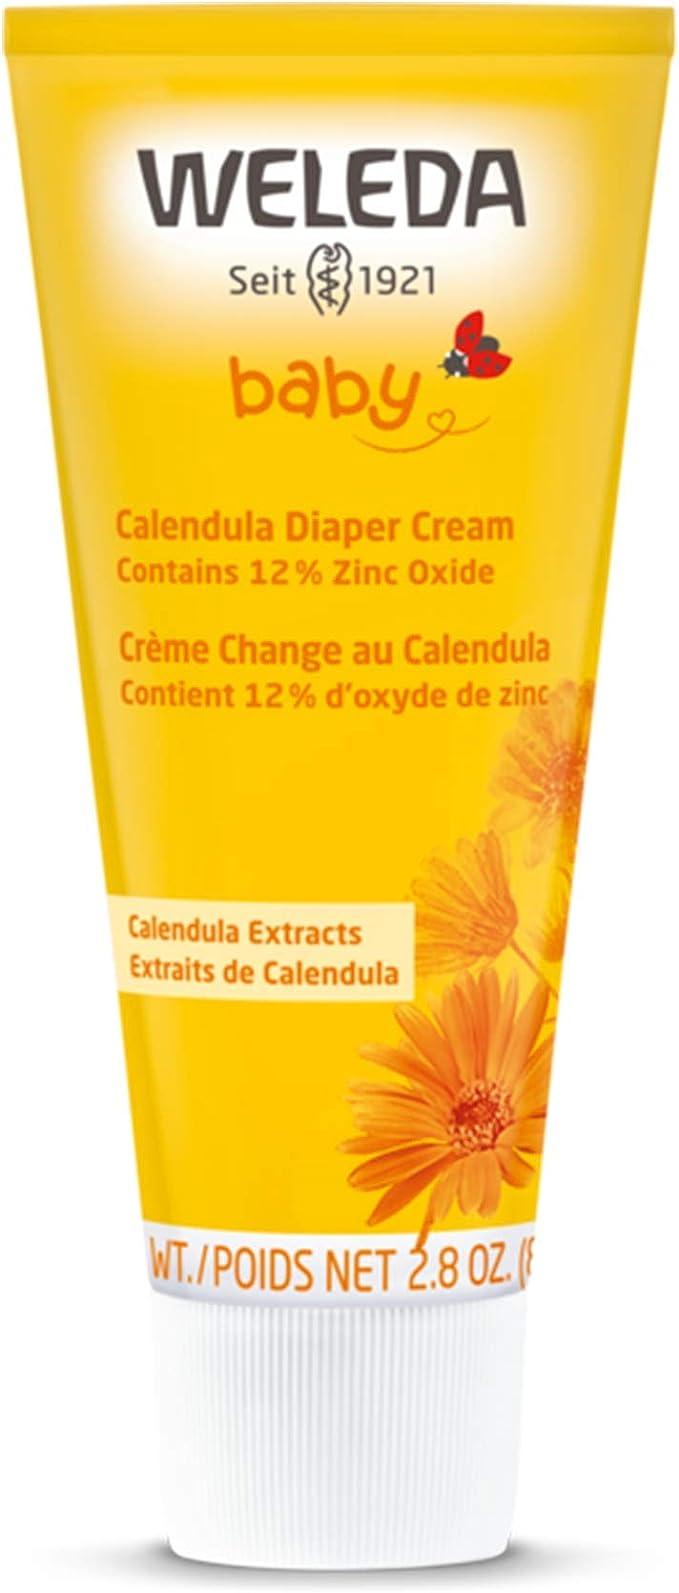 Amazon.com: Weleda Baby Calendula Diaper Cream, 2.8 Ounce: Health & Personal Care